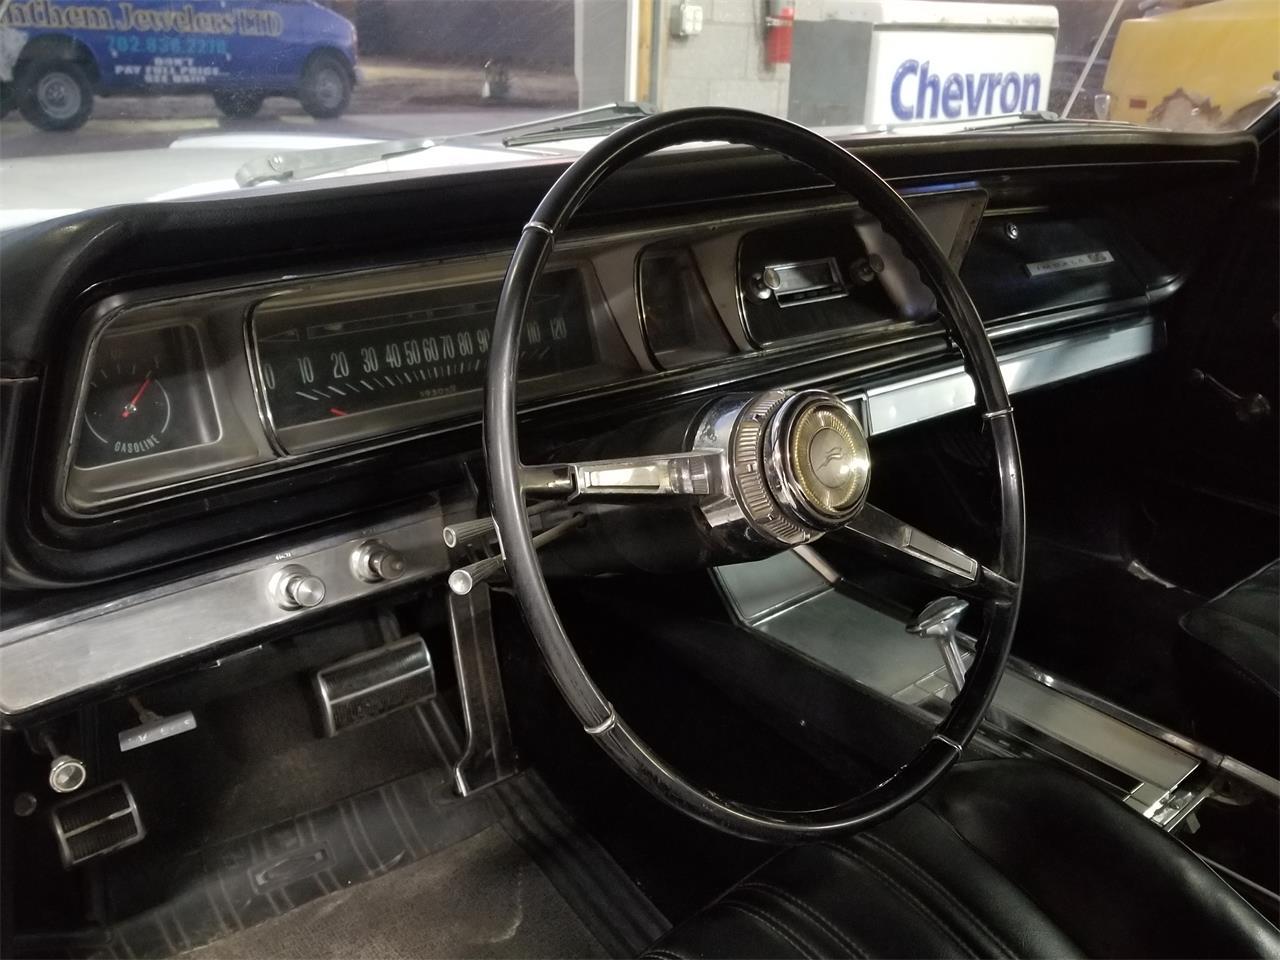 1966 Chevrolet Impala SS (CC-1320872) for sale in Buckeye, Arizona